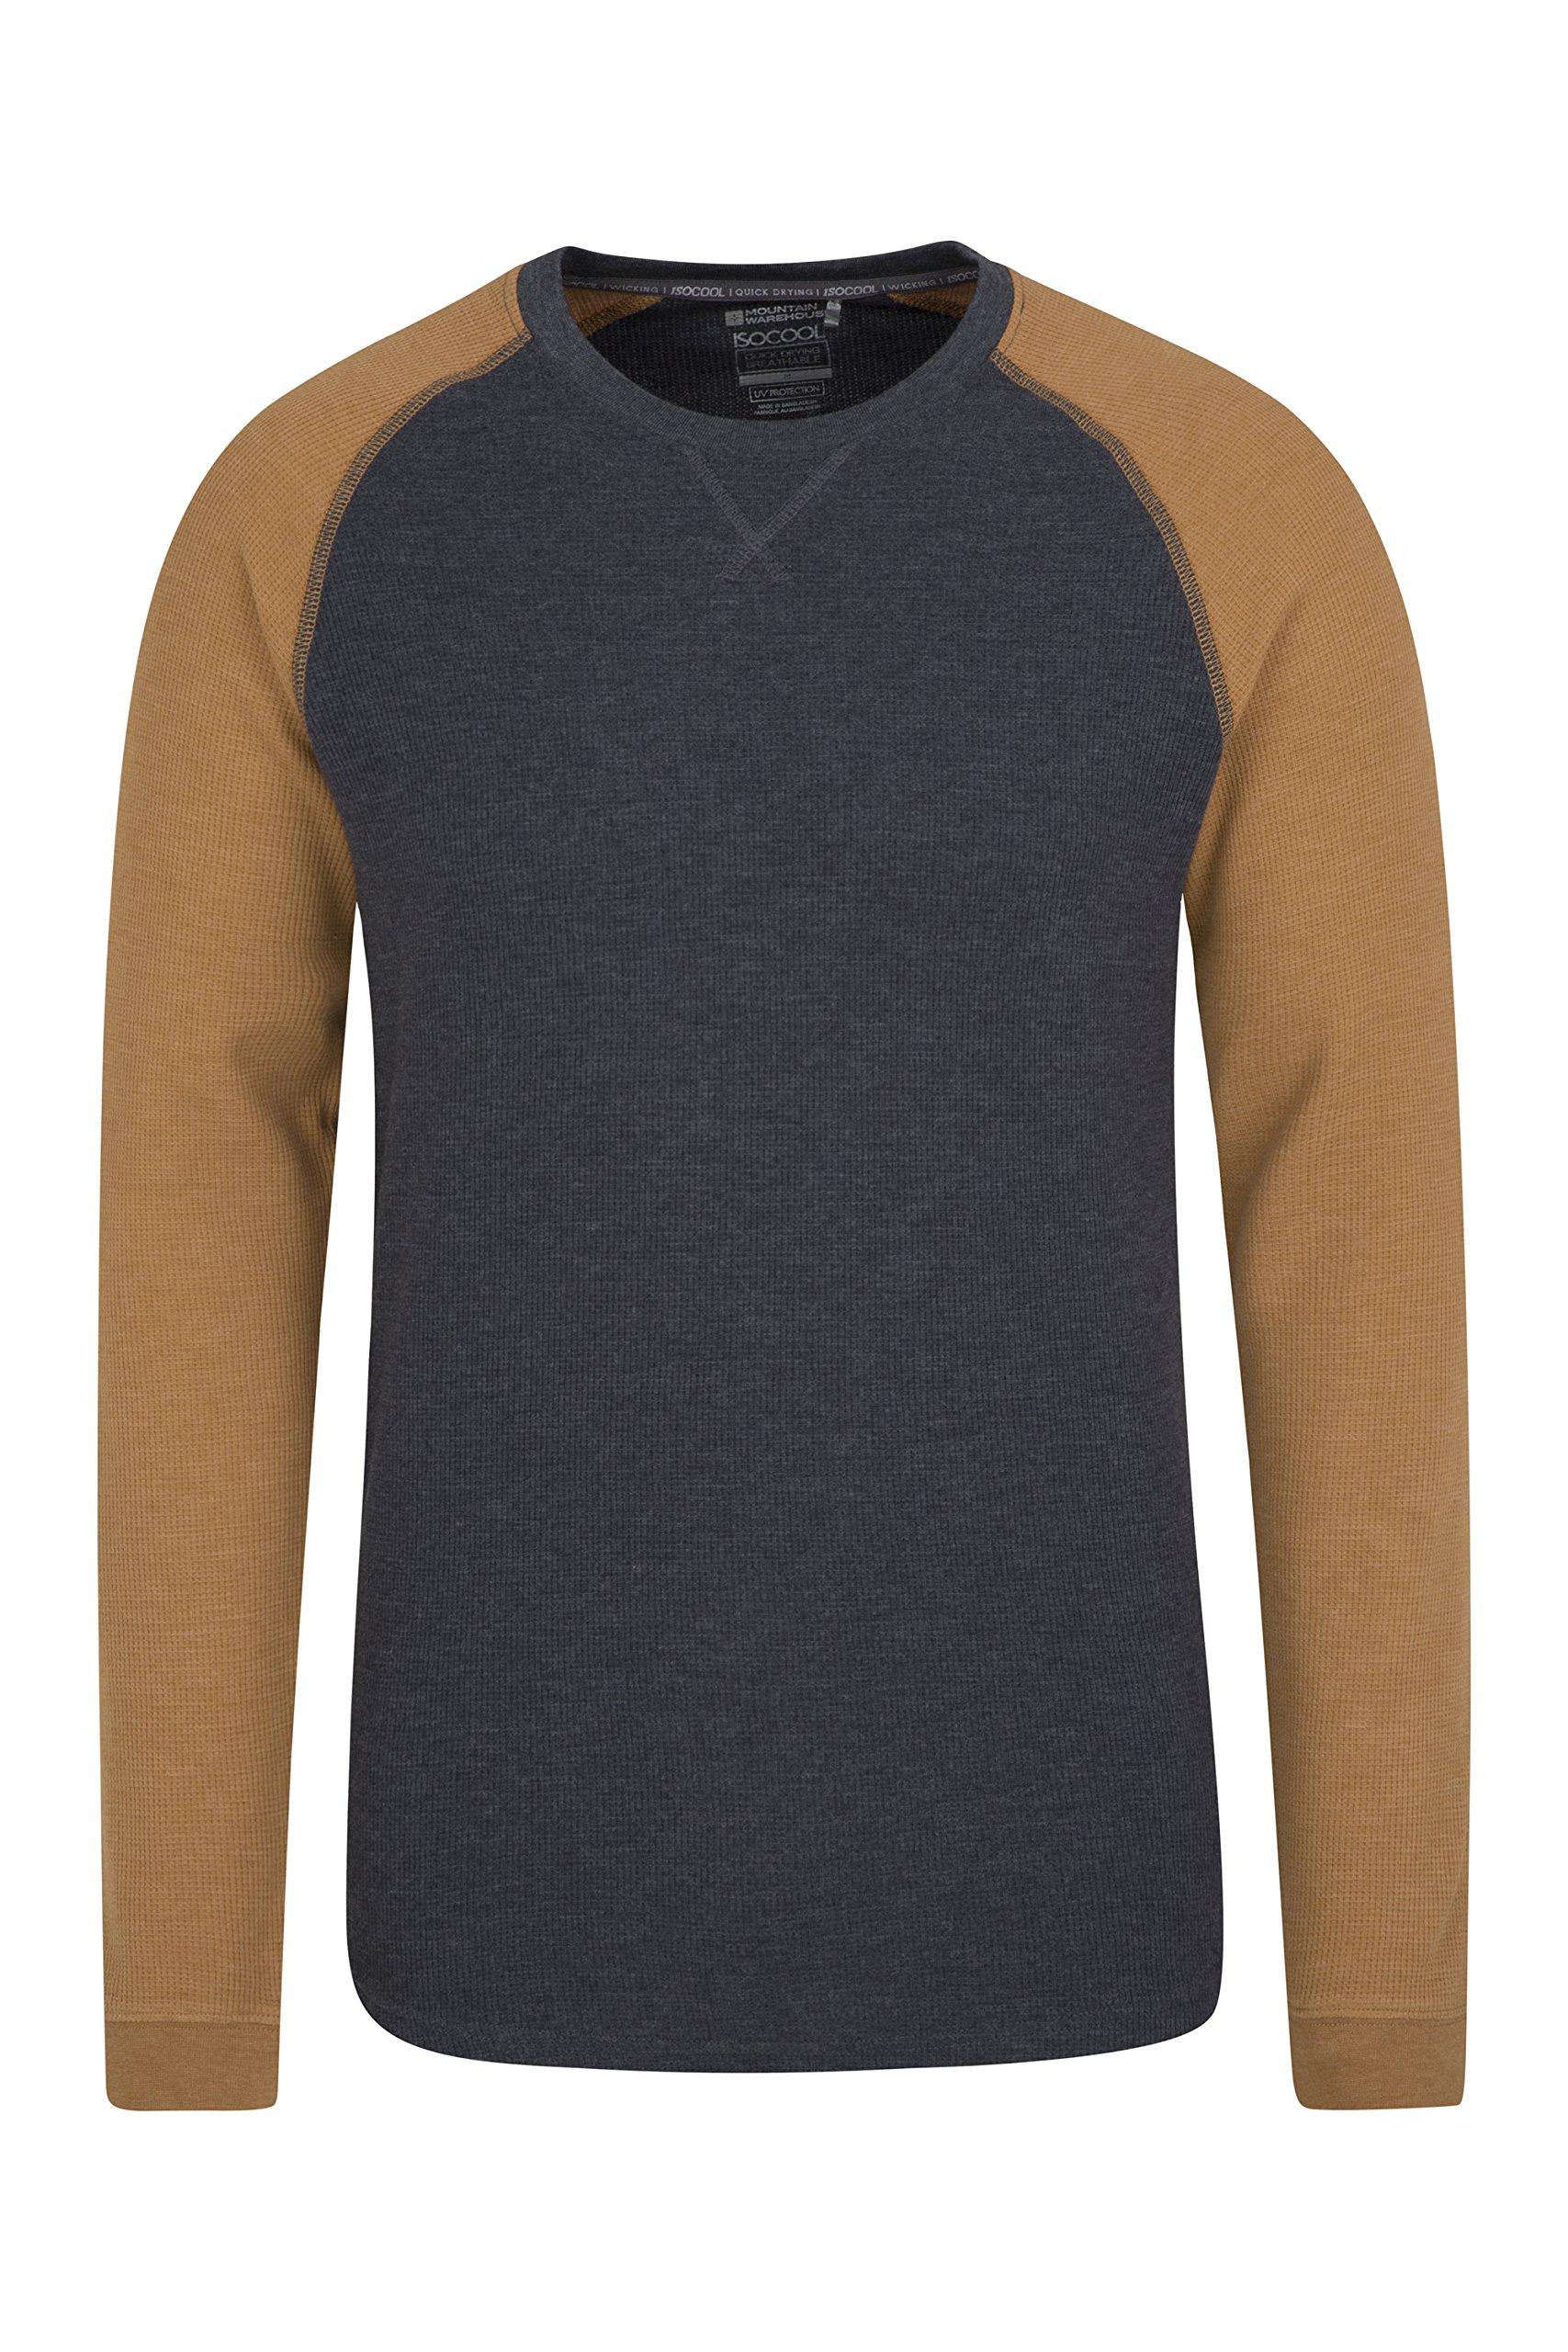 Mountain Warehouse Waffle Long Sleeve Mens T-Shirt - Round Neck Tee Dark Grey Medium